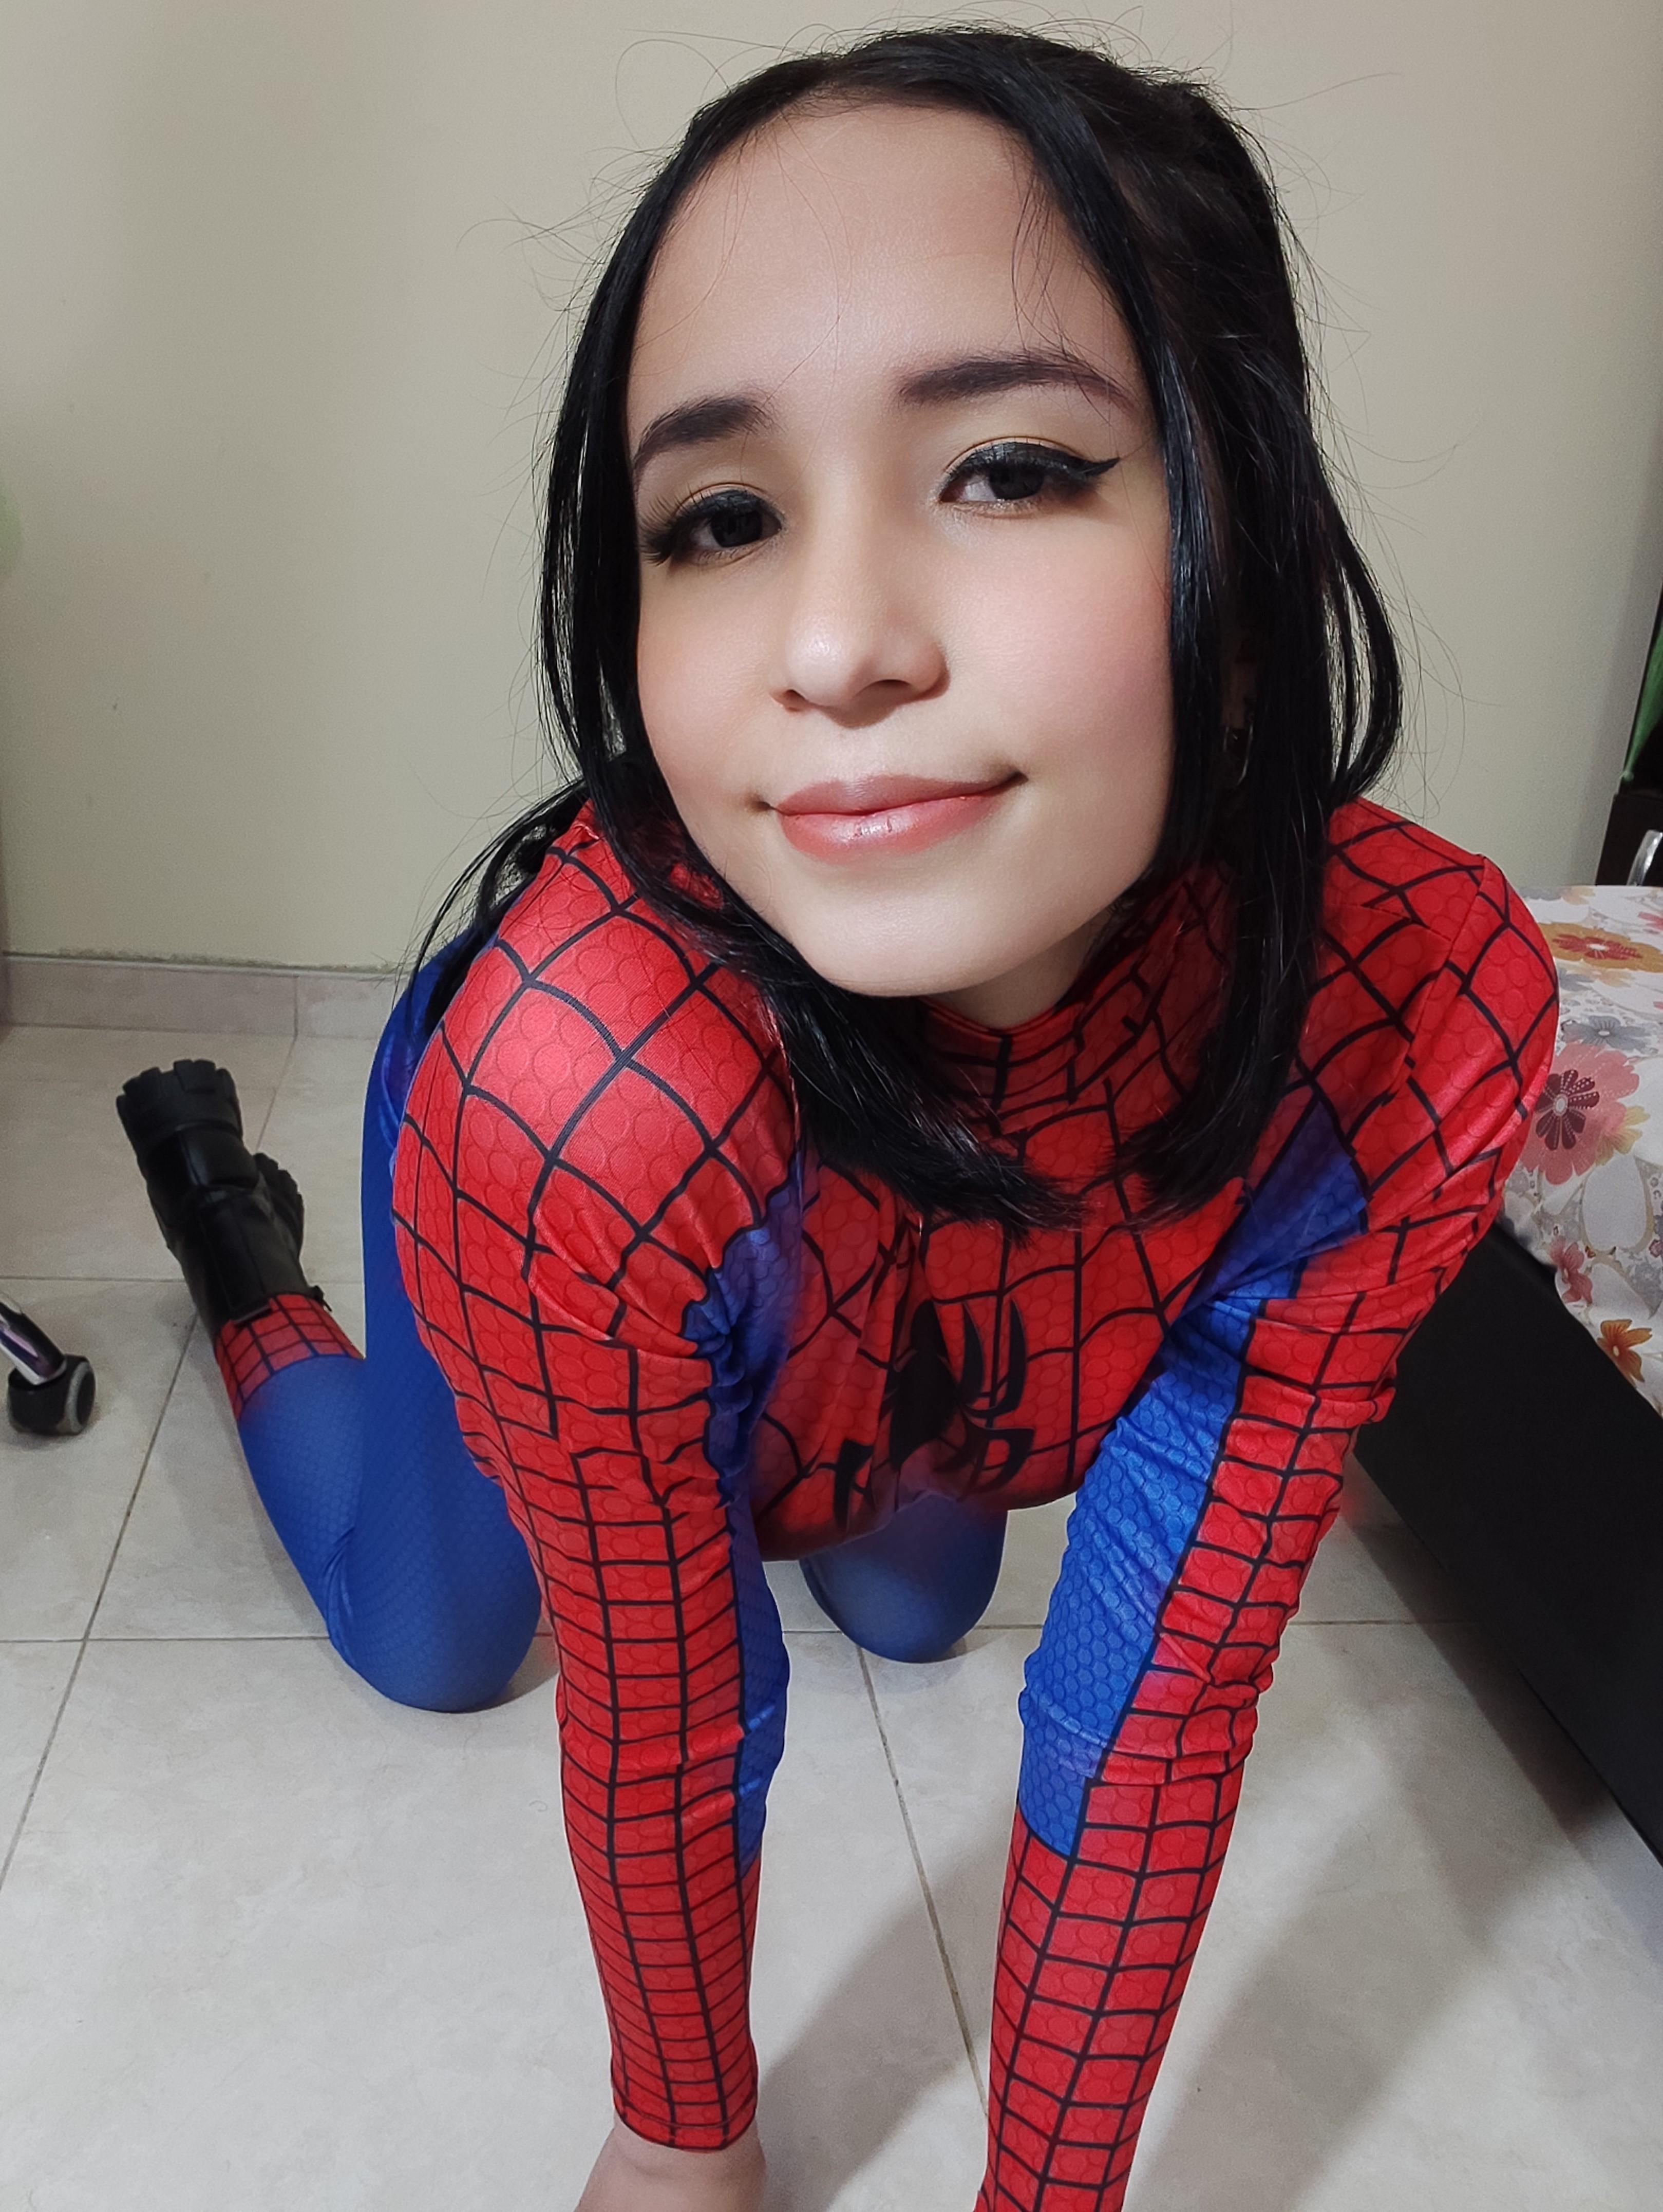 Chica kawaii?s=hyzmbu6mlipqsgddk0bxmmeewl99xbac4rx94ownpu8=